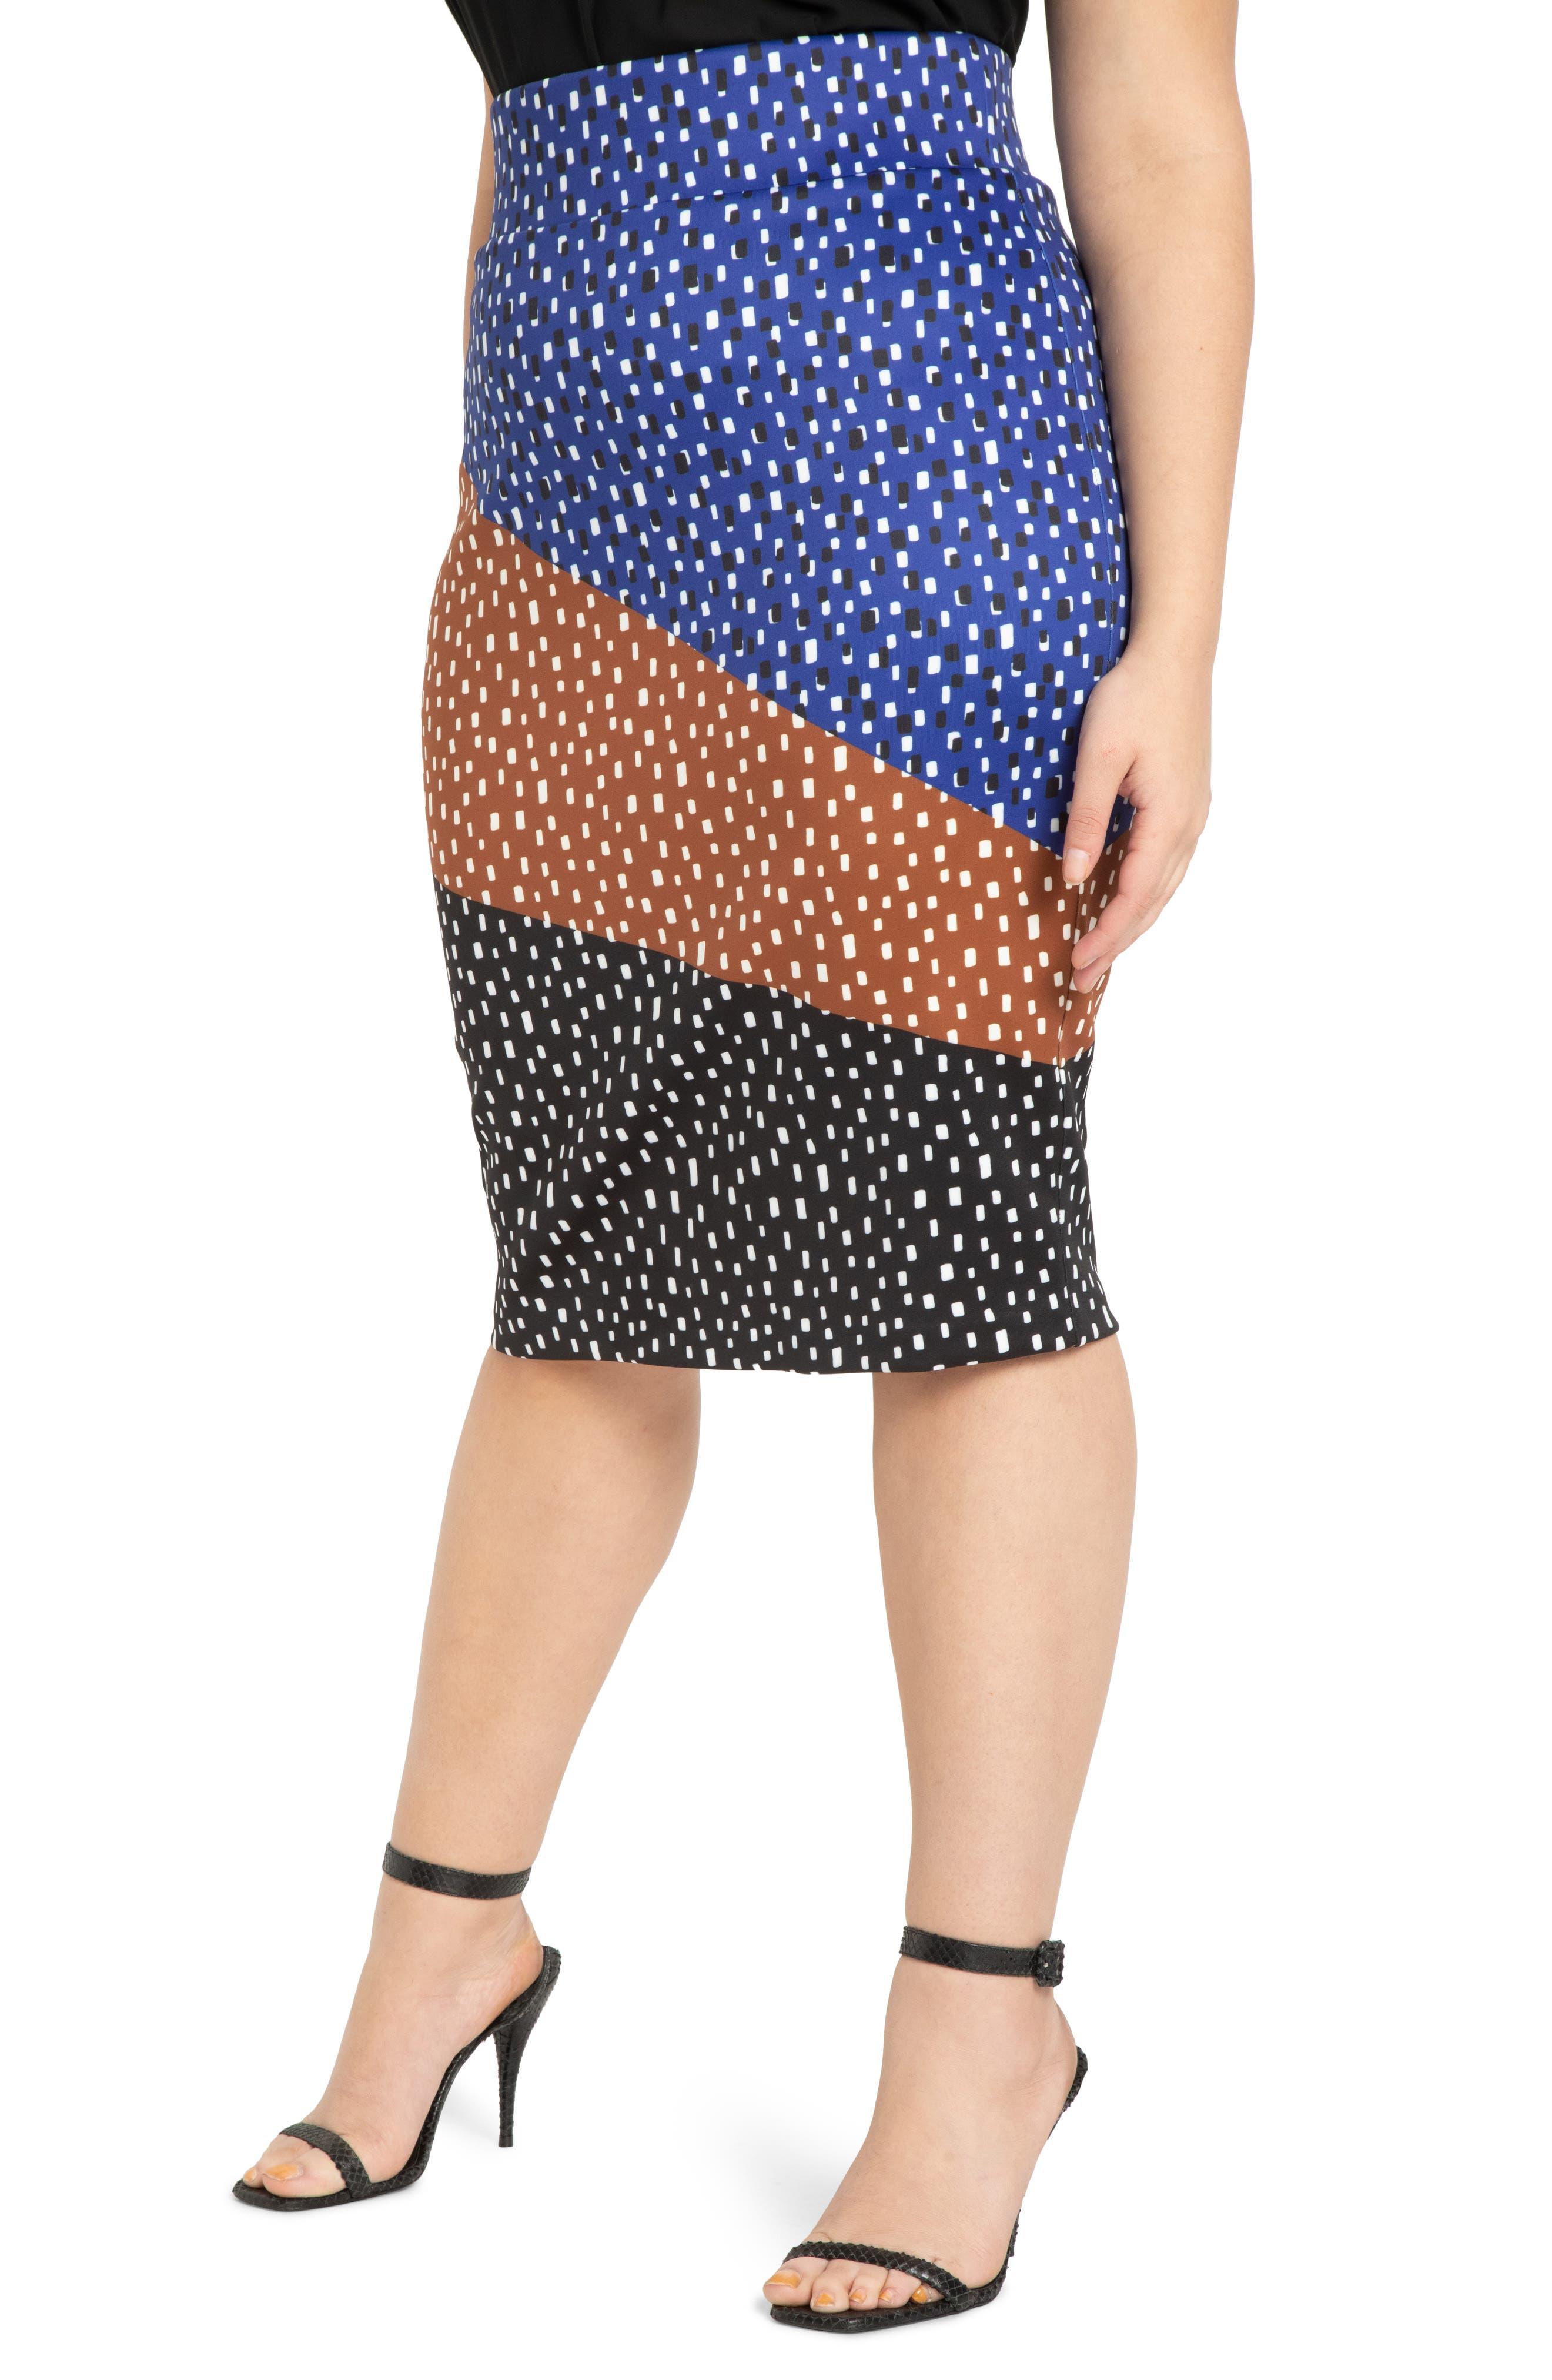 Colorblock Printed Neoprene Skirt